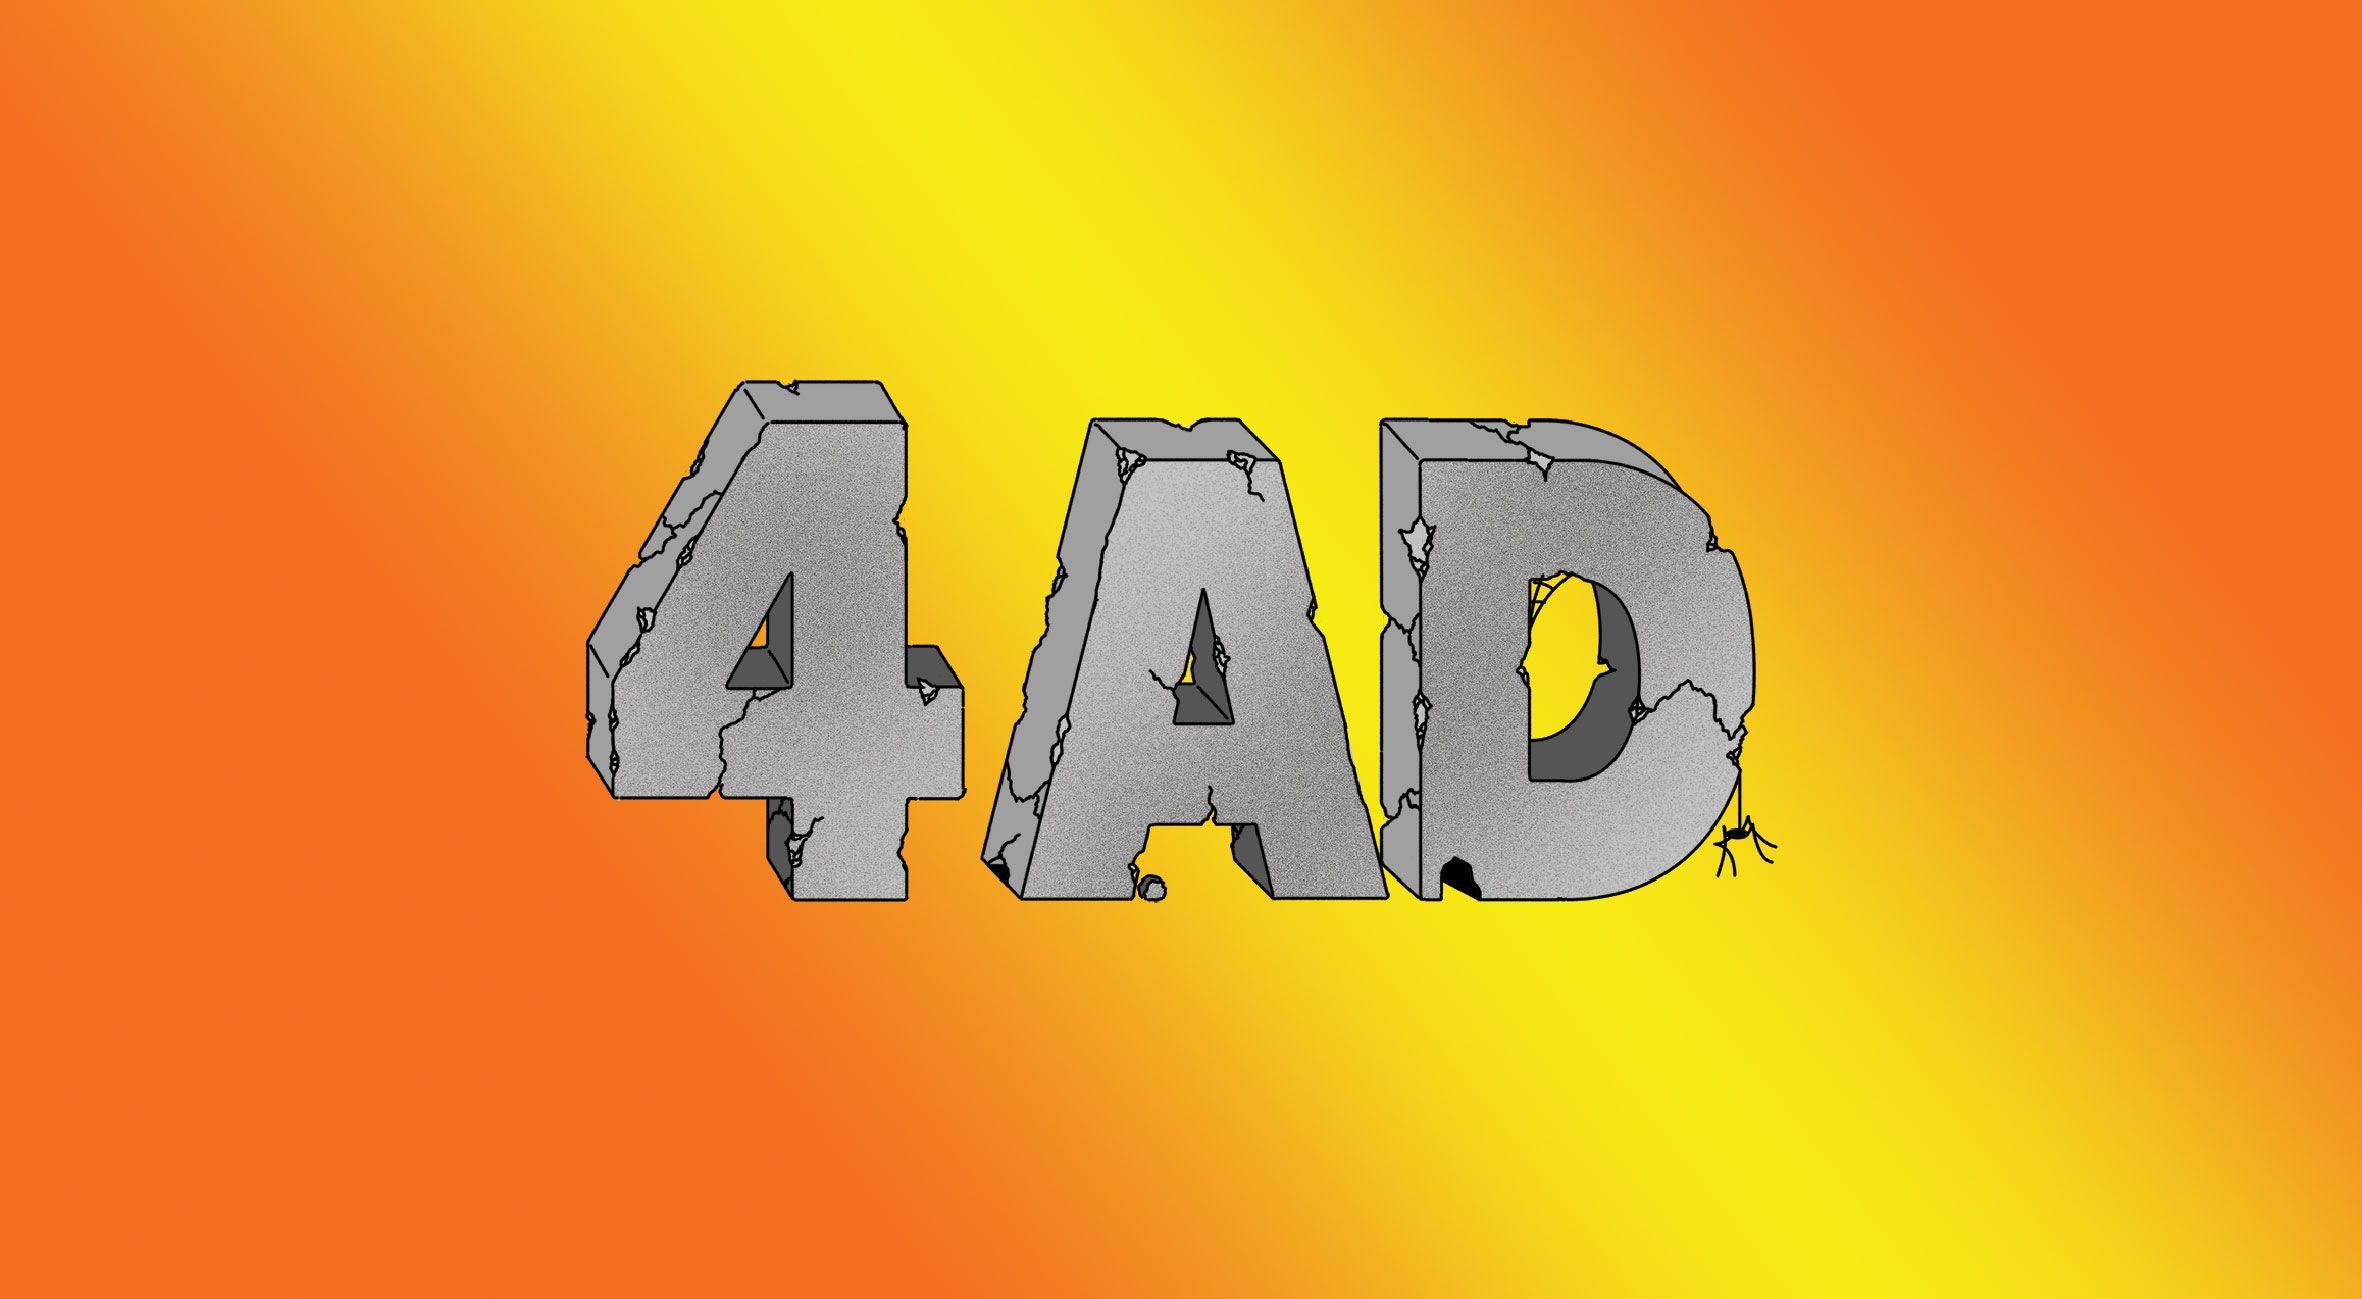 Stil - 4AD Special w/ Vio DJ (September 2020)